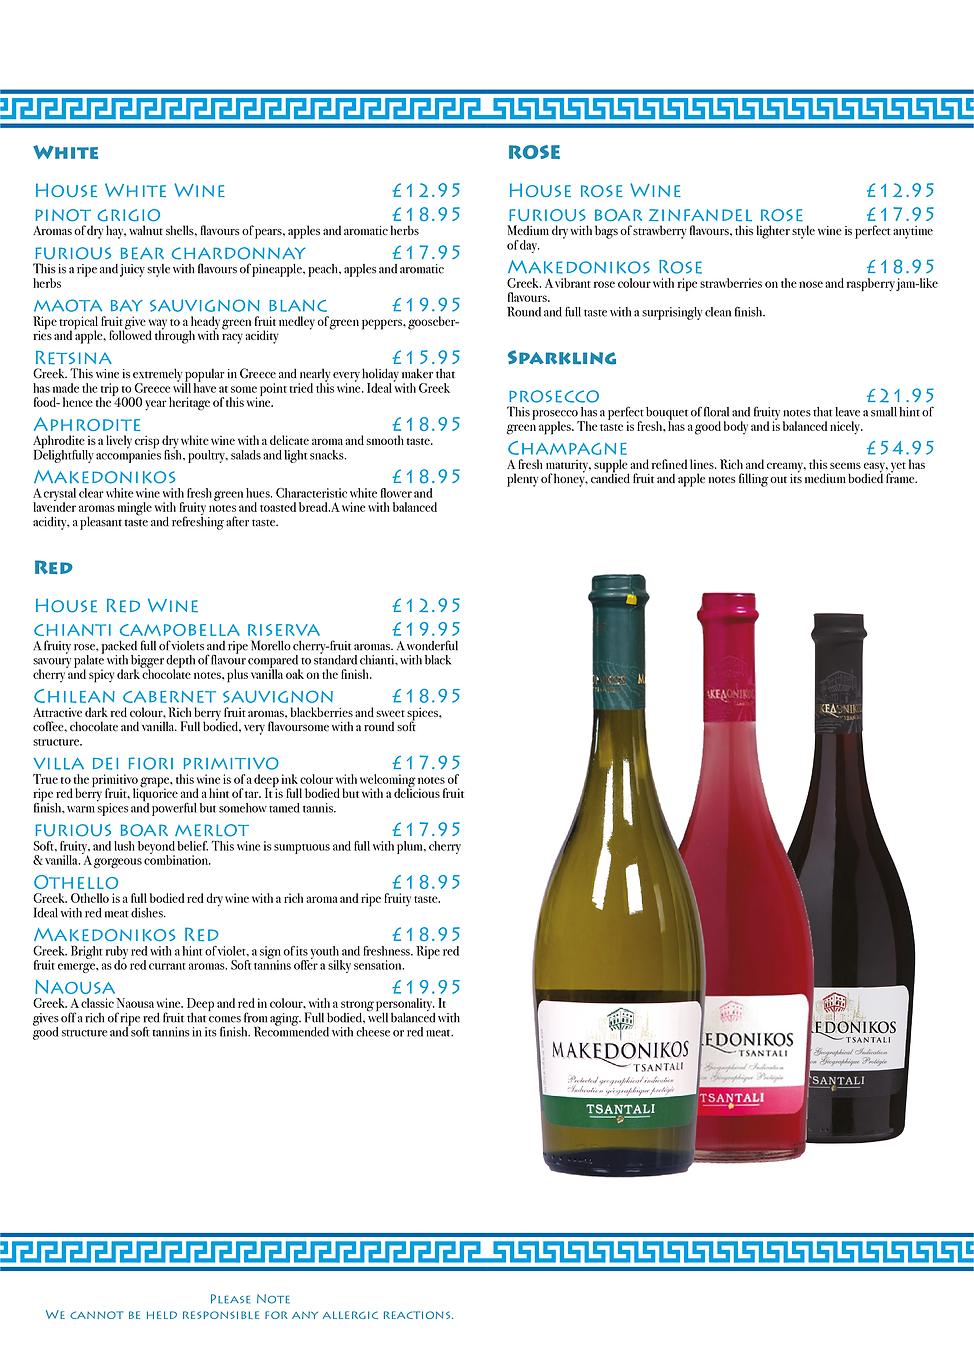 Nikoz Wine Menu A4 2017-02.png